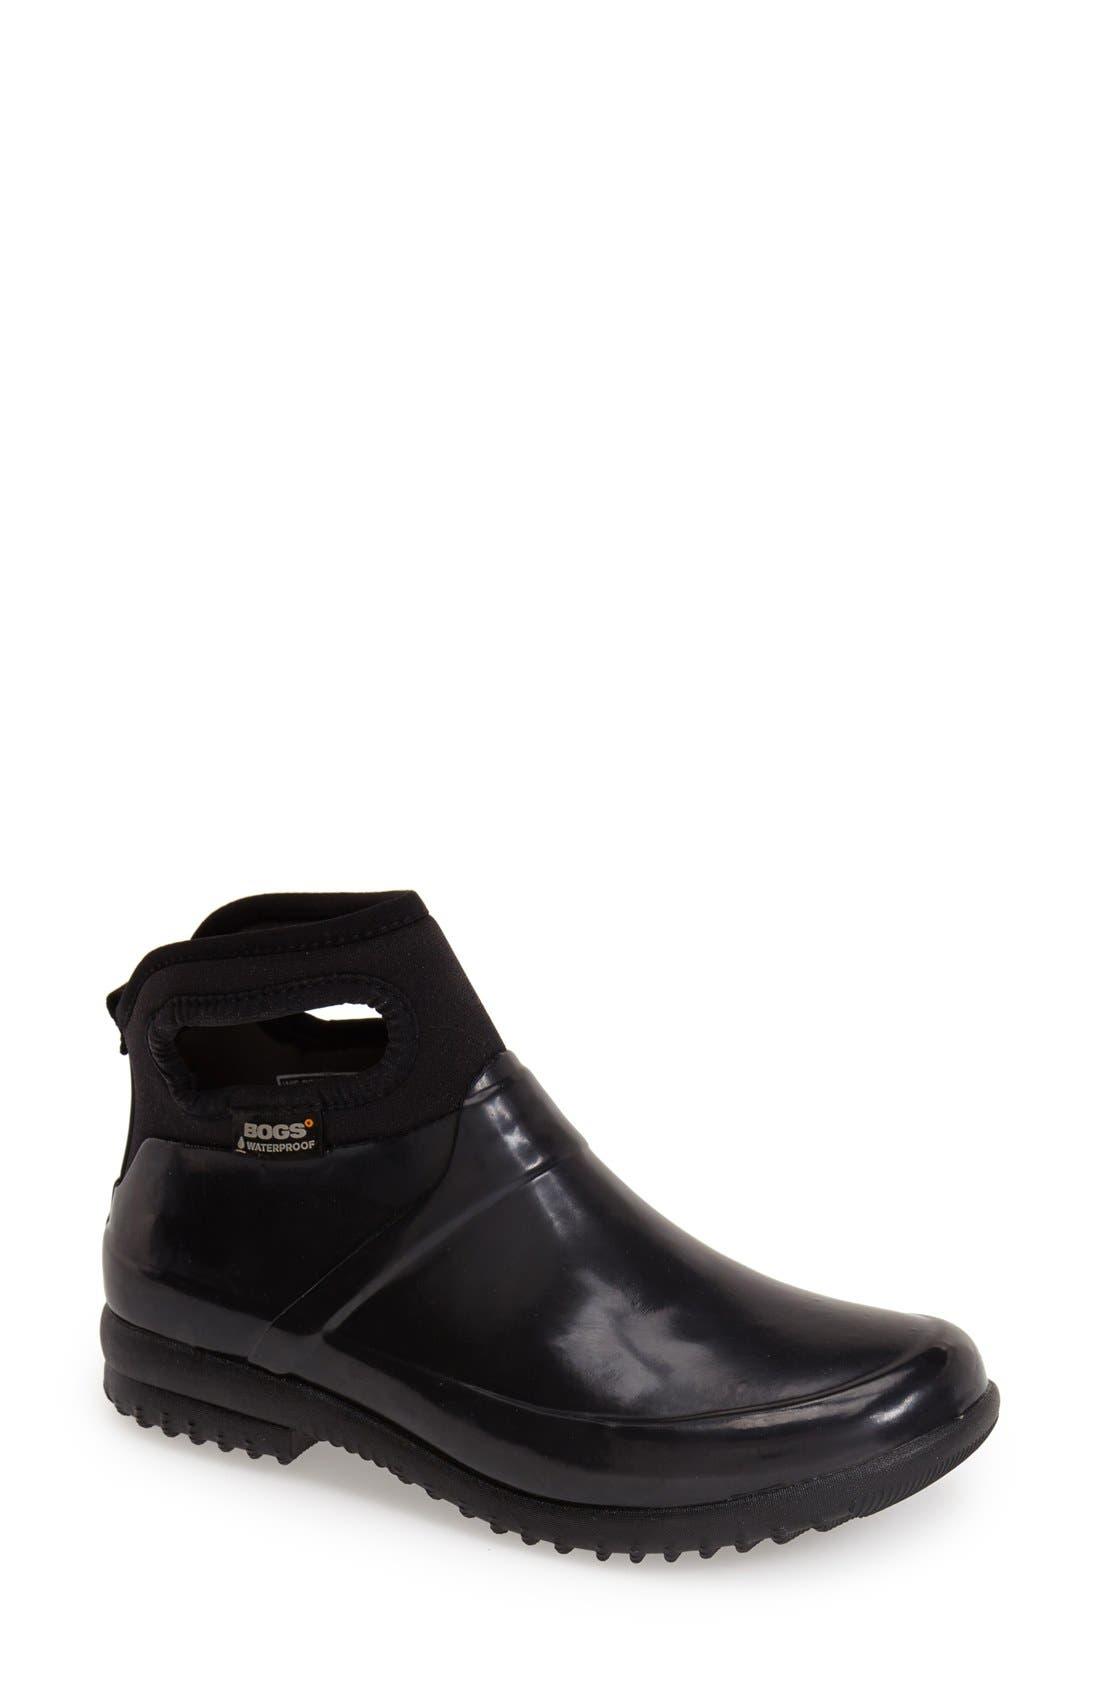 'Seattle' Waterproof Short Boot,                         Main,                         color, Black